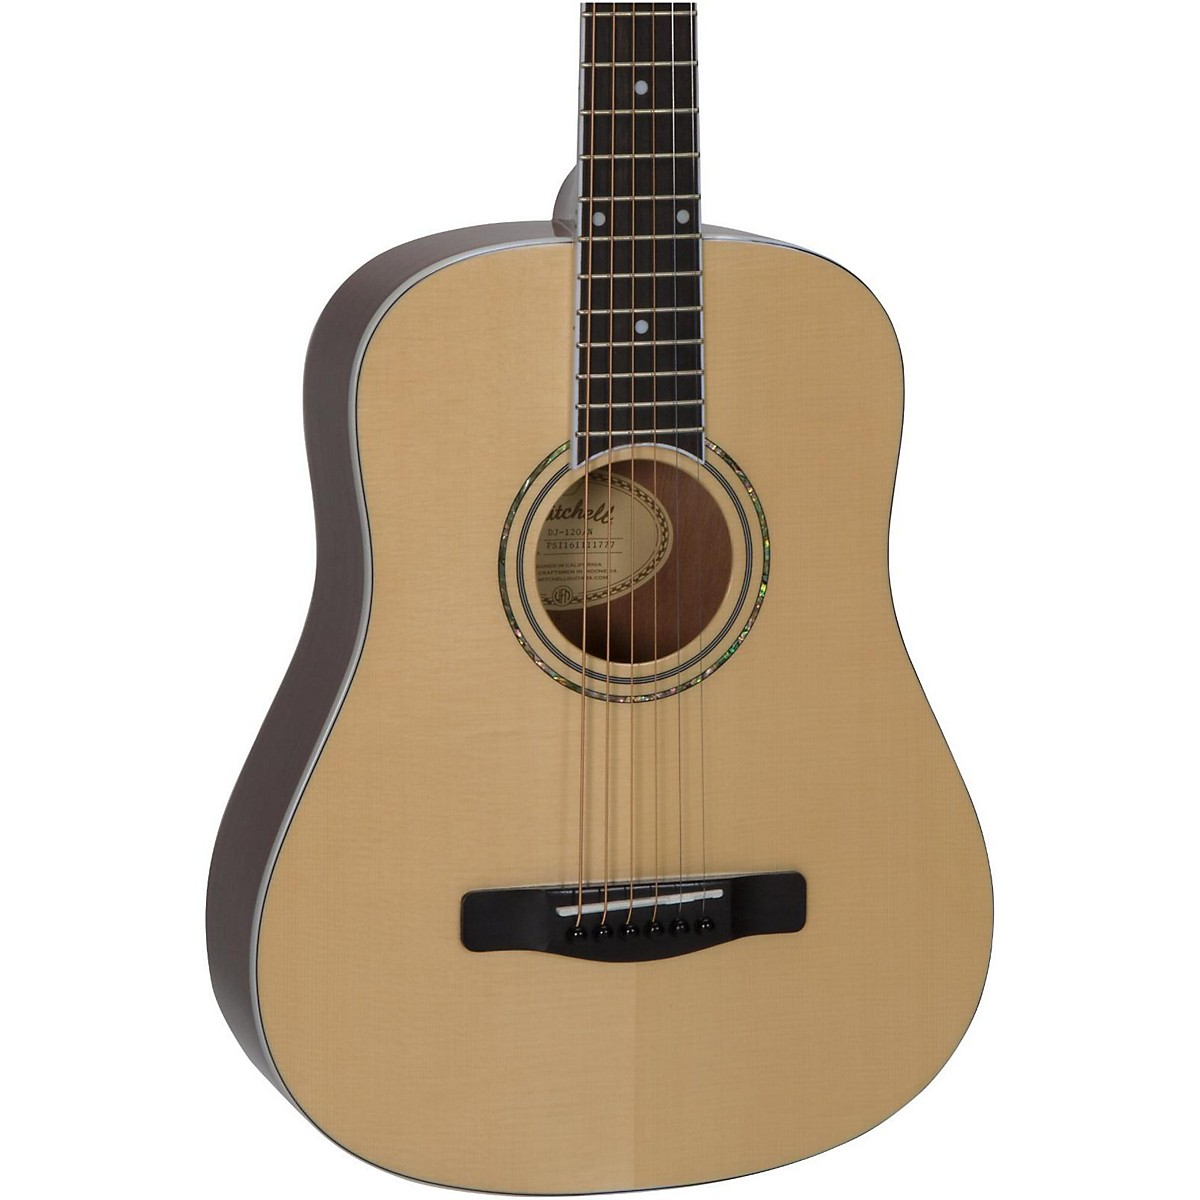 Mitchell DJ120 Junior Dreadnought Acoustic Guitar